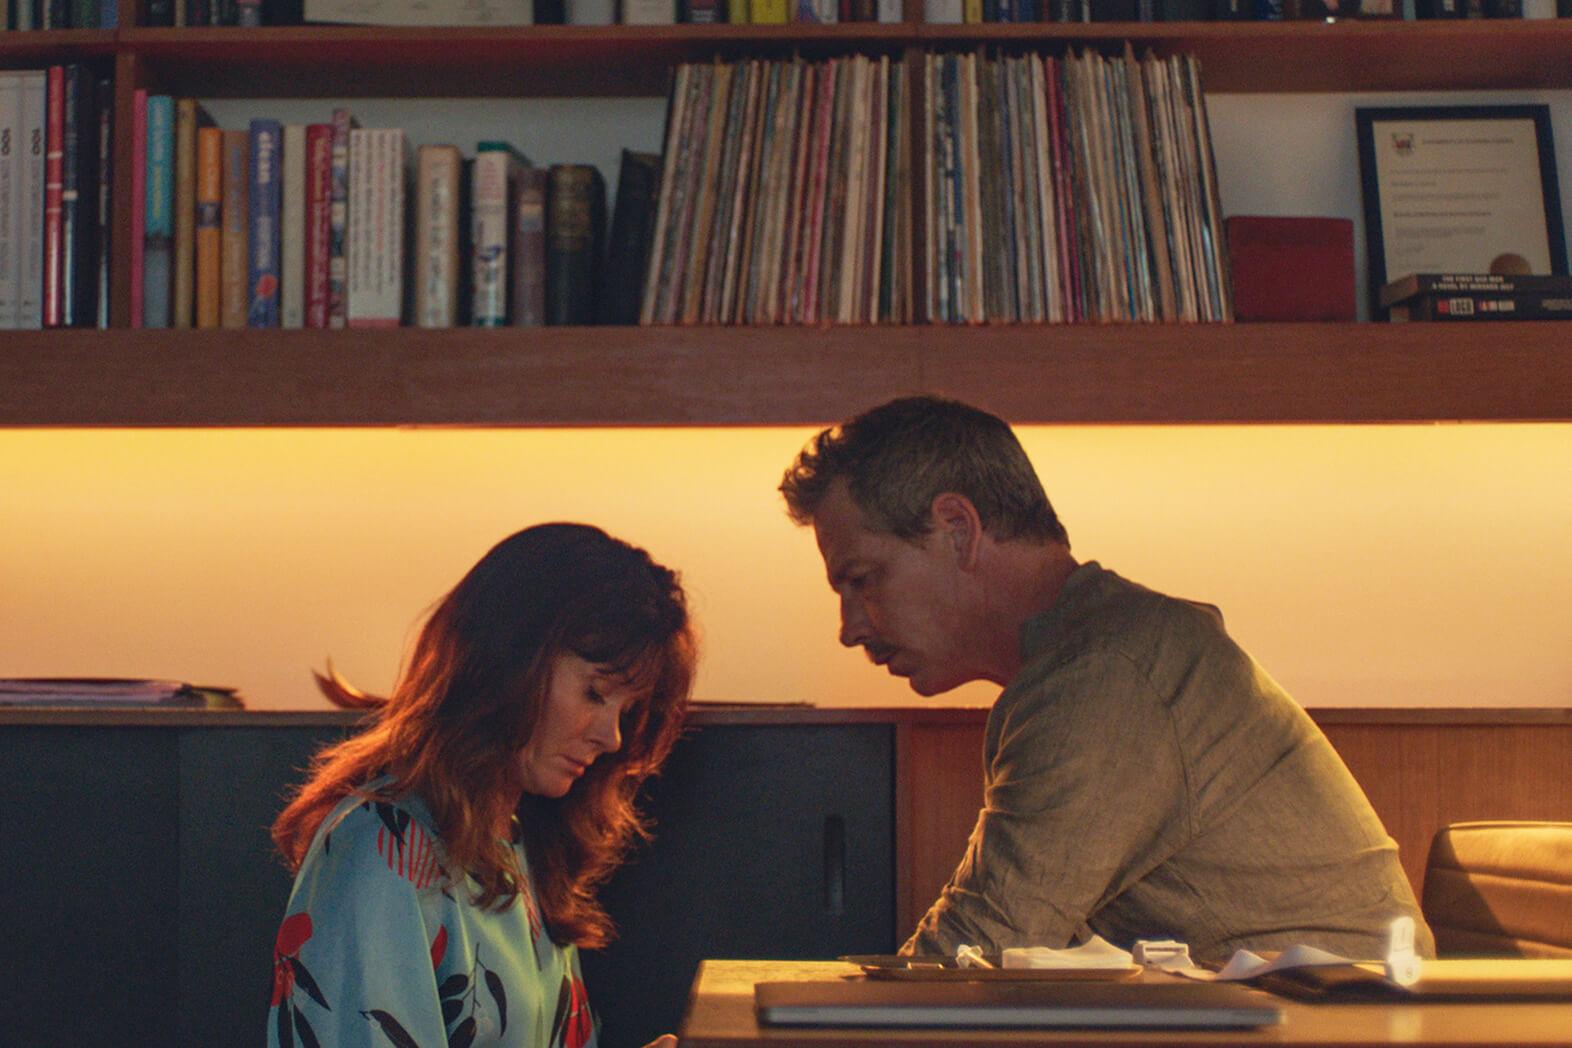 babyteeth-2019-movie-shannon-murphy